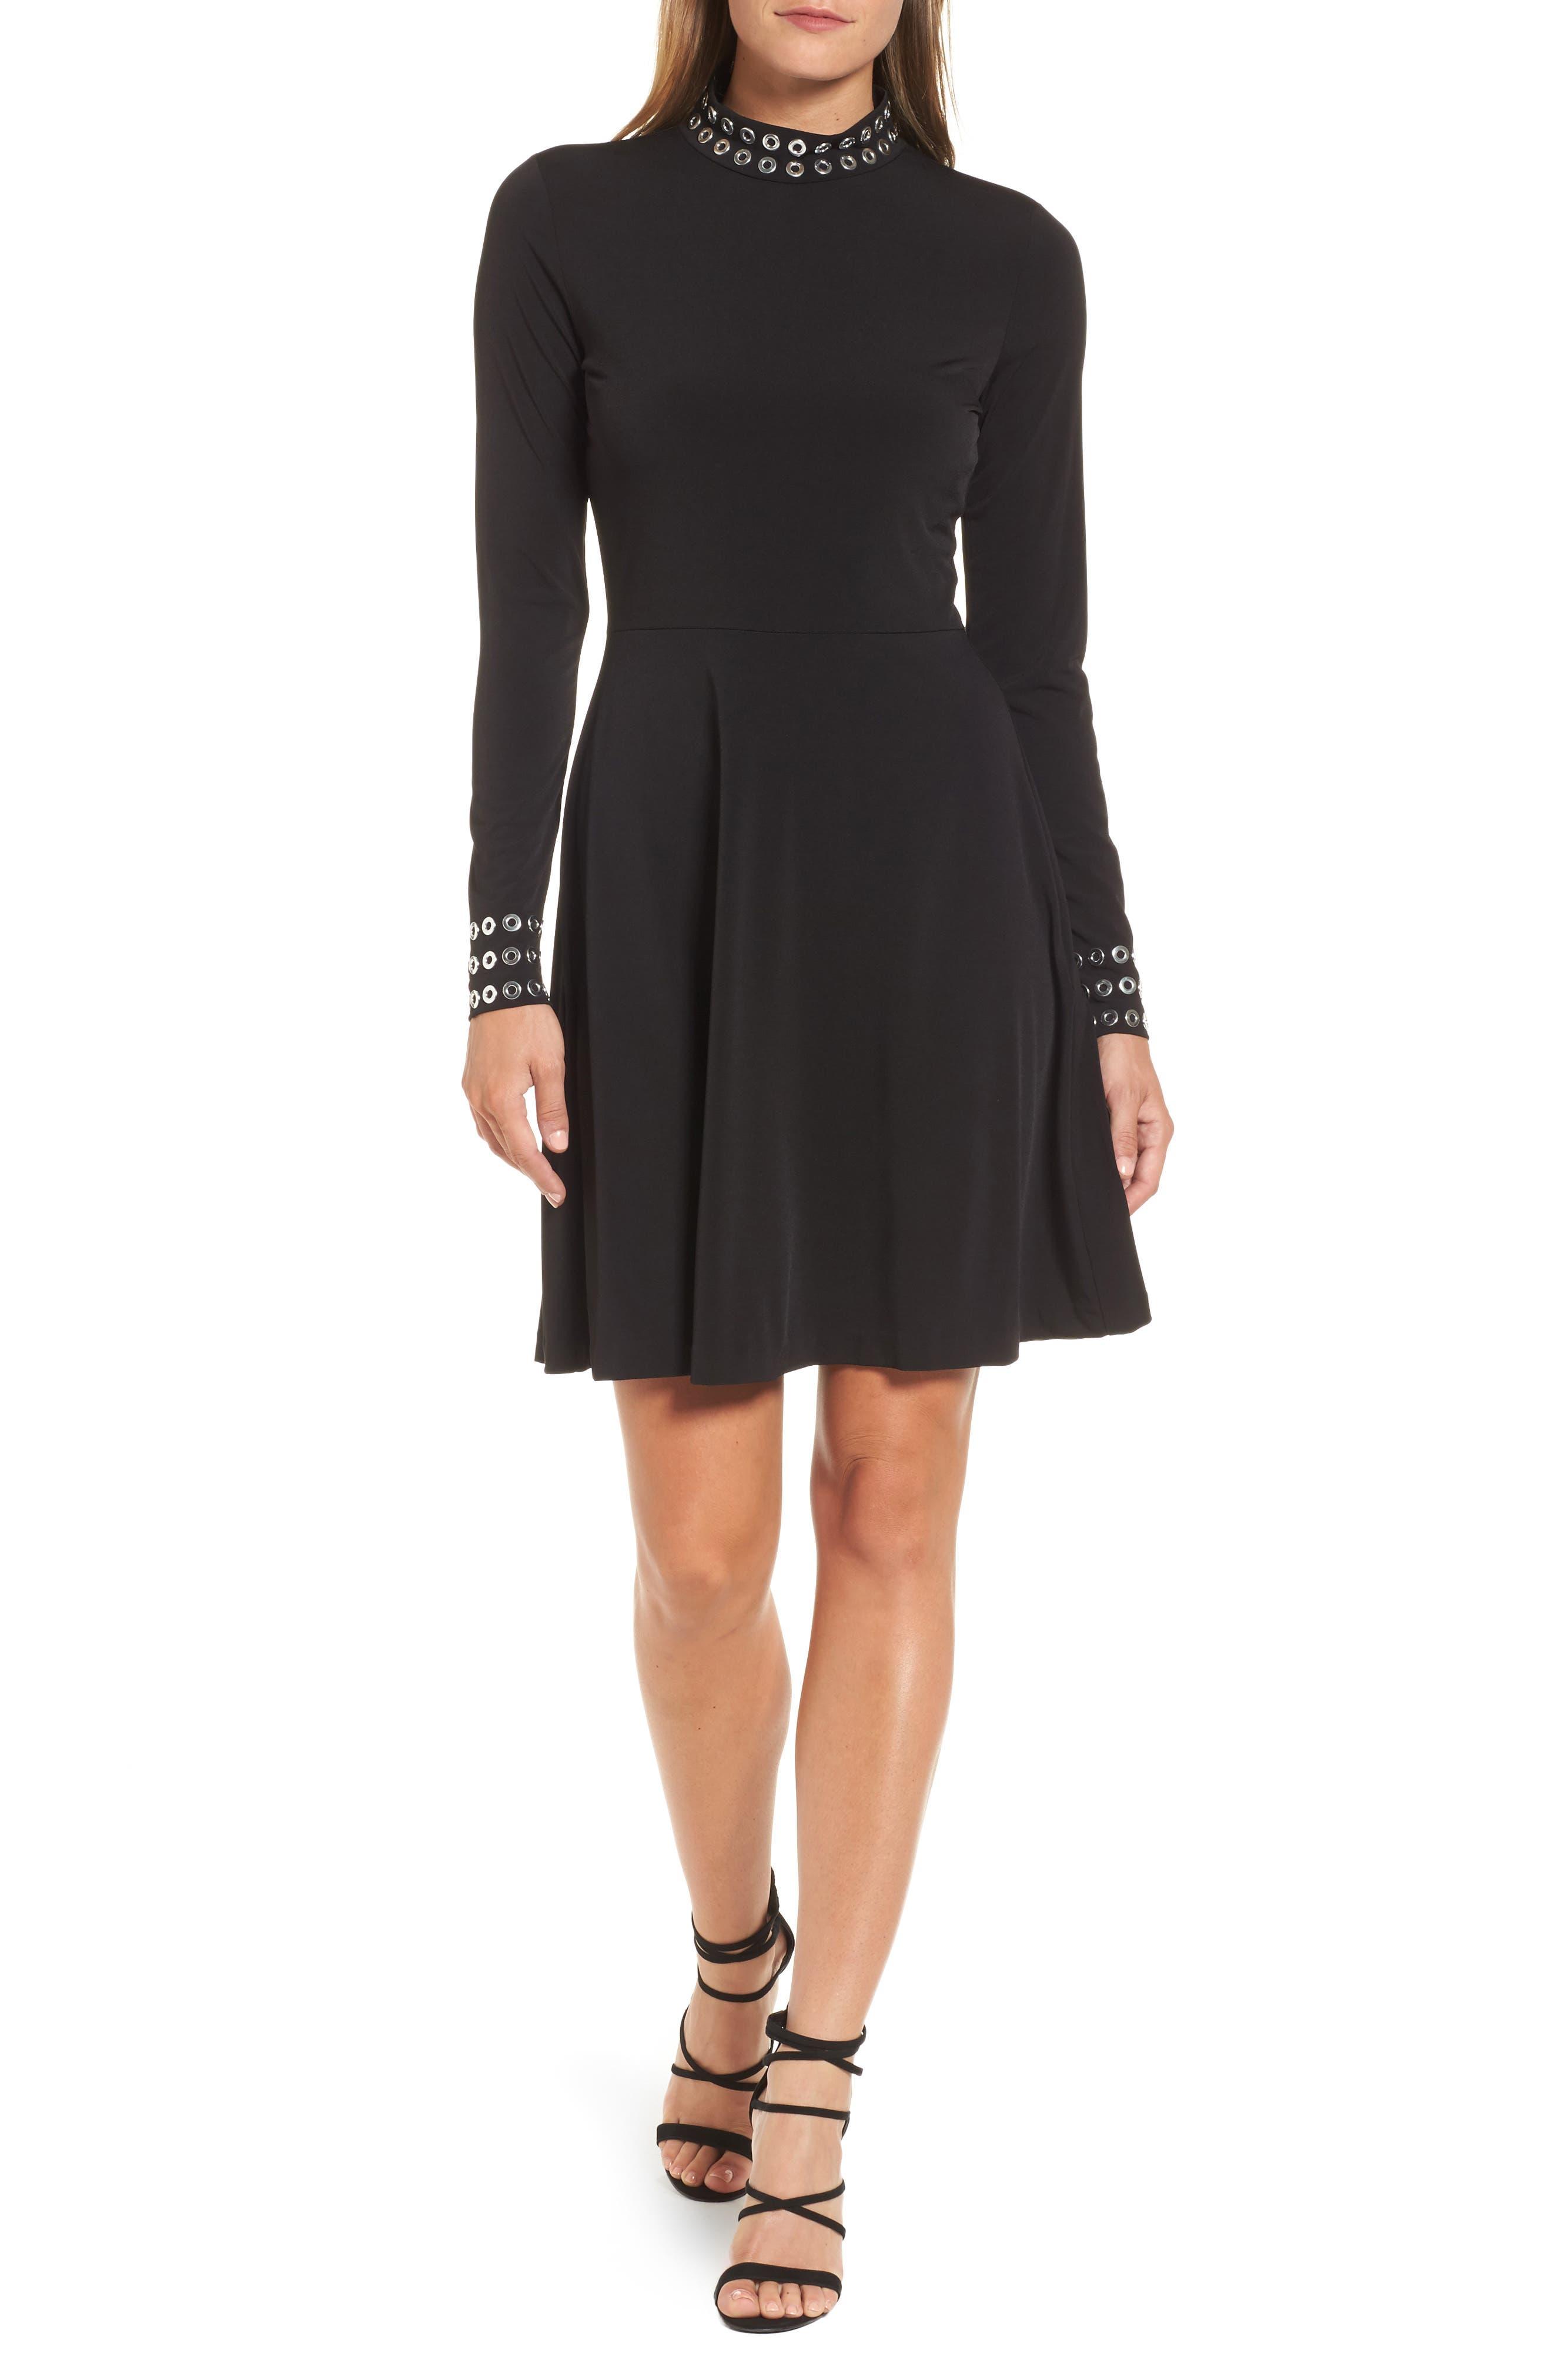 Grommet Mock Neck Knit Dress,                         Main,                         color, 001